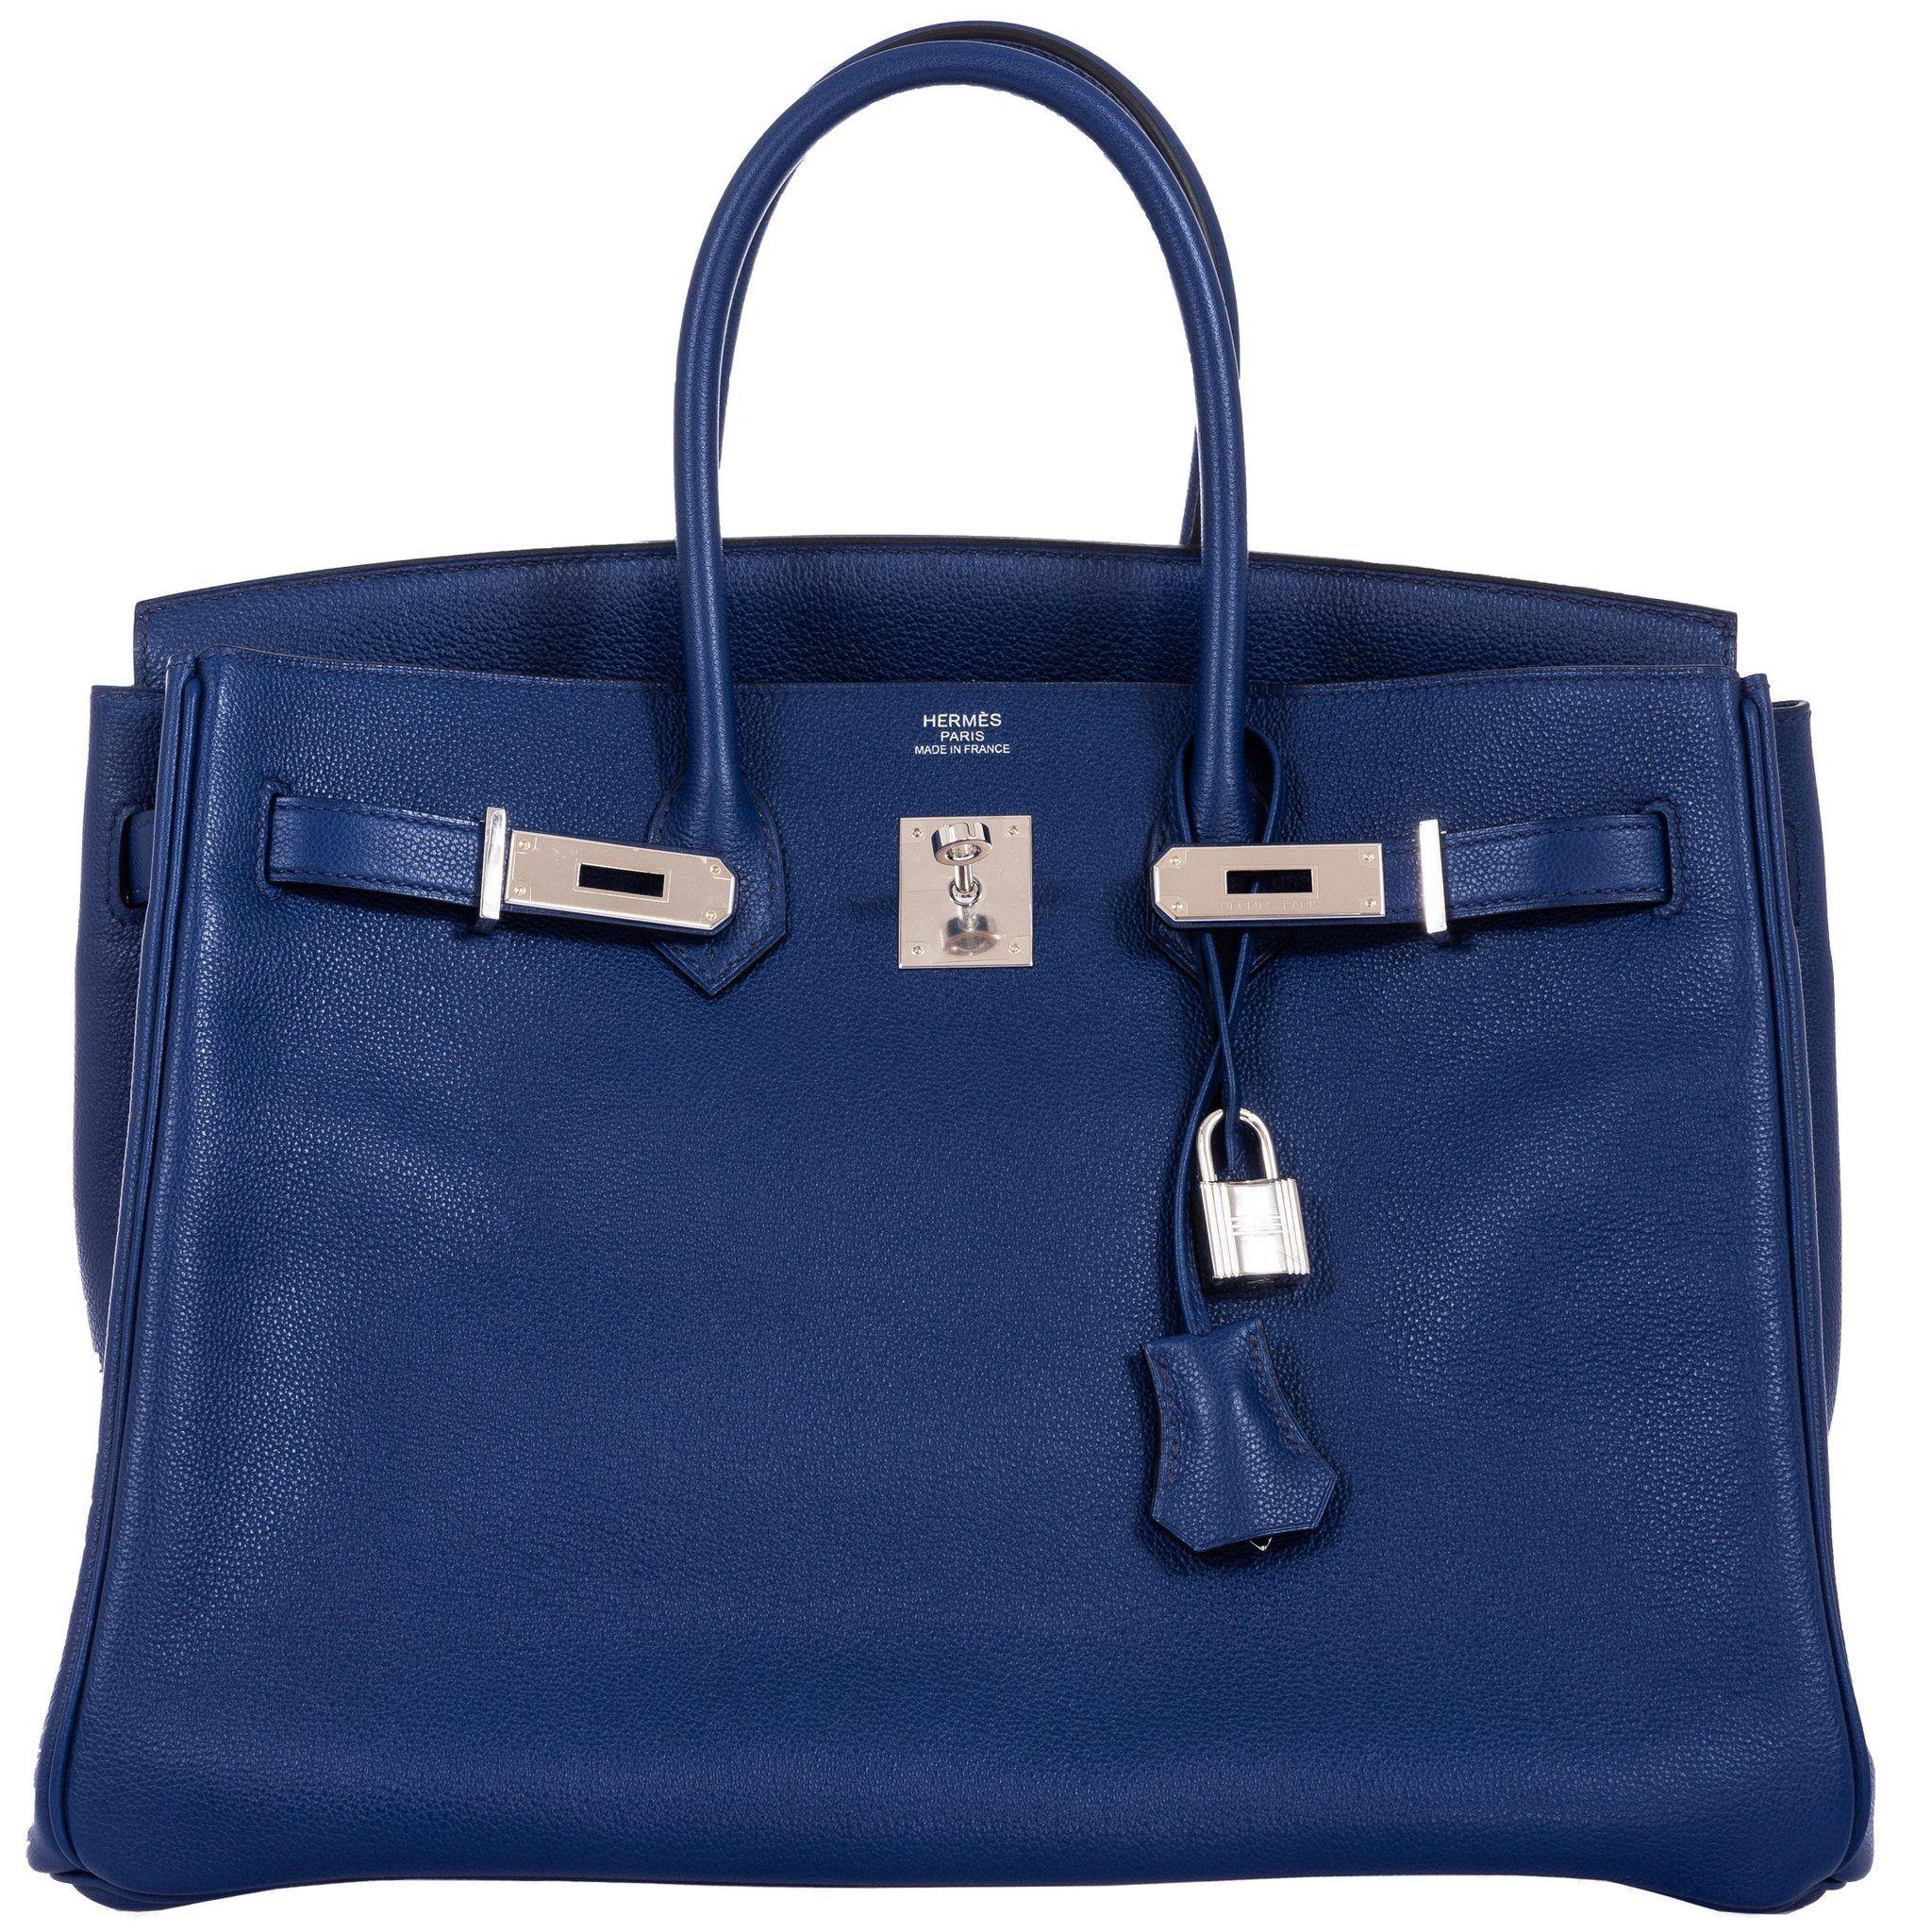 Hermes Birkin 35 Blue Sapphire Novillo Toile Printed Sea Surf Interior Palladium Hardware Special Edition Janefinds Hermes Birkin Hermes Handbags Birkin